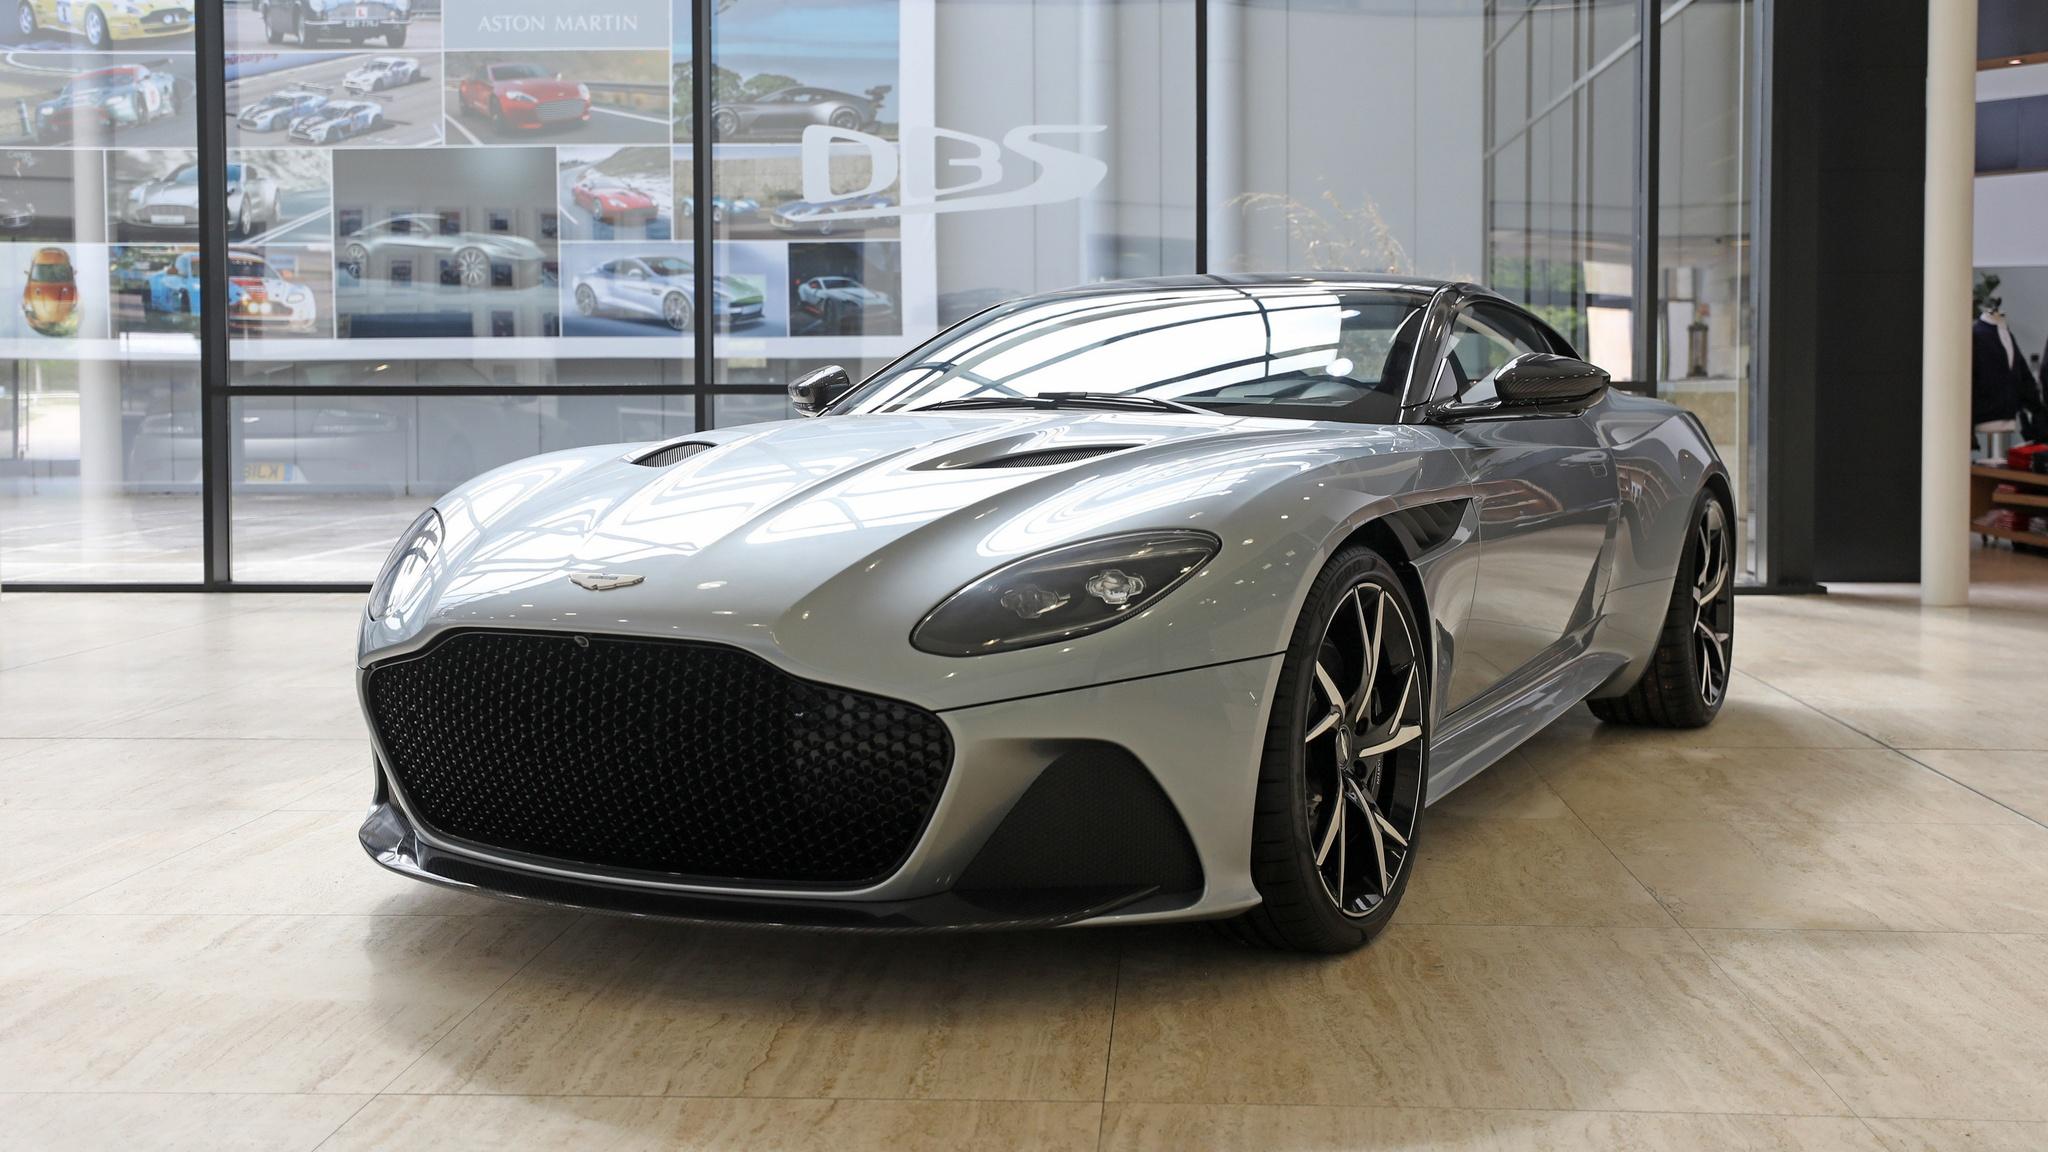 Chinese Demand Boosts Aston Martin Profits Financial Times